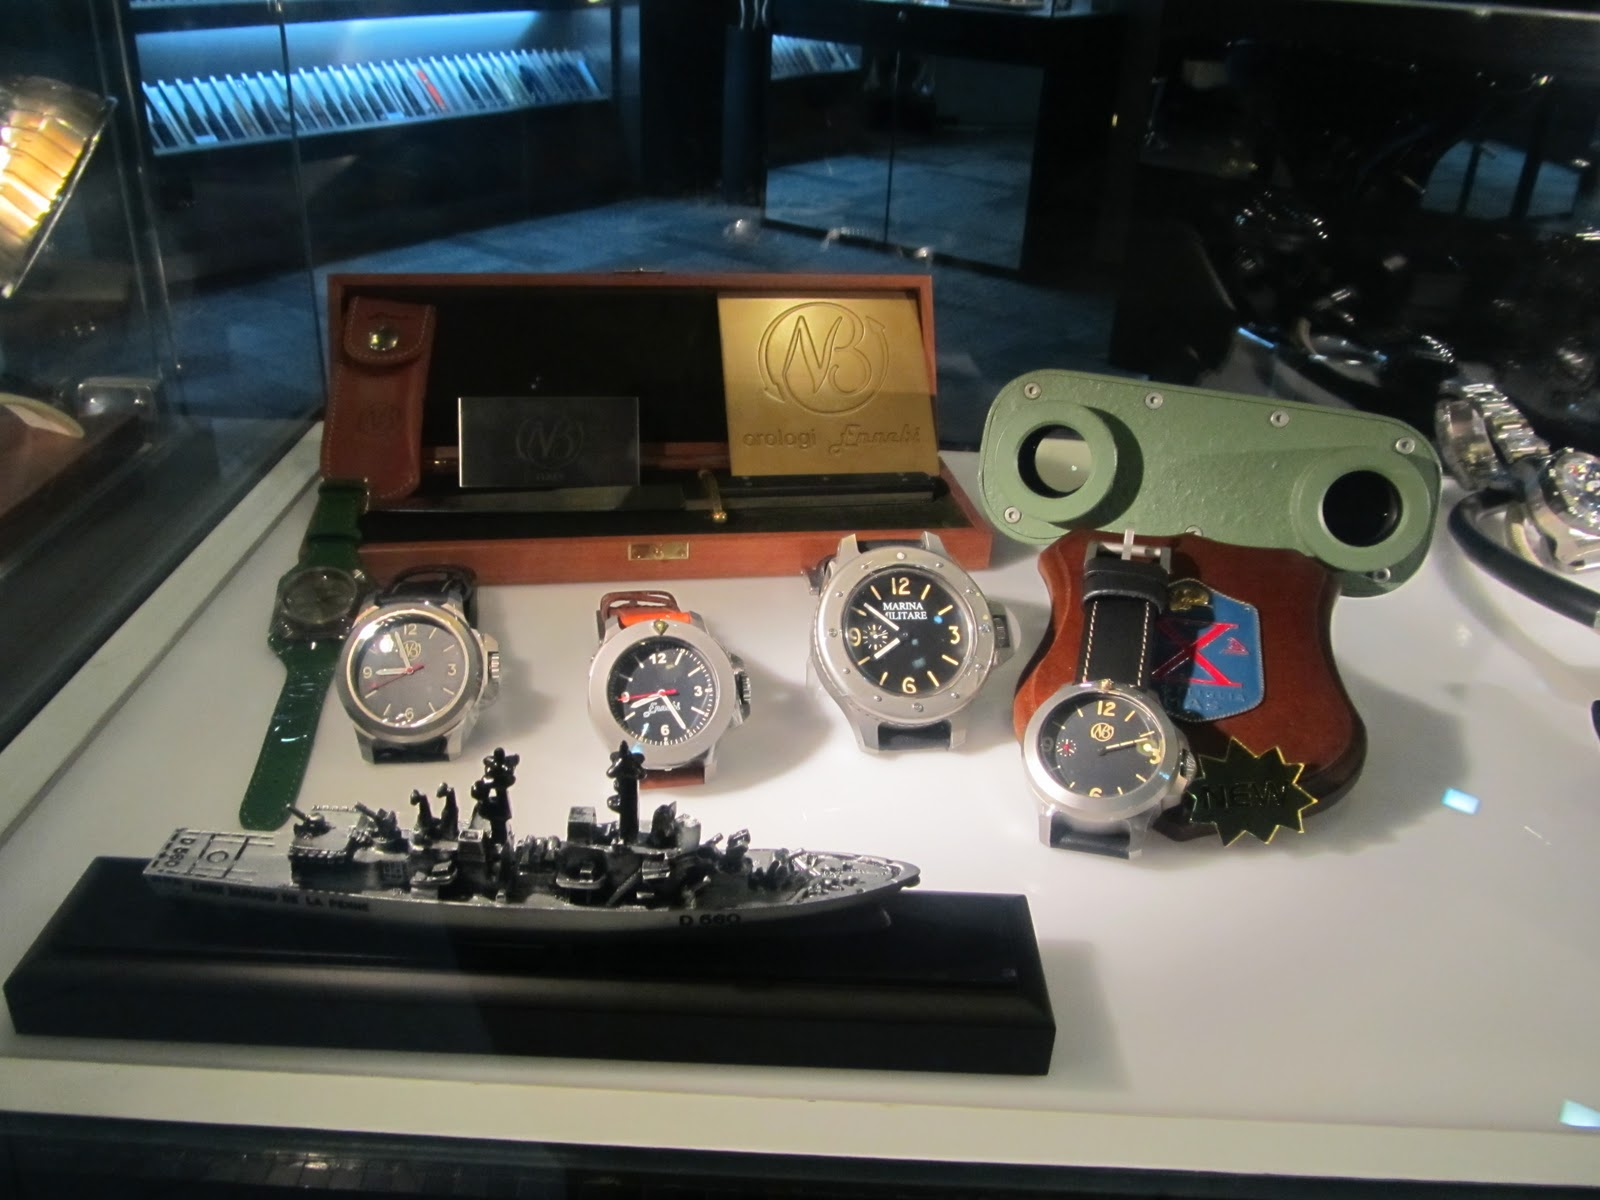 Gnomon watch store